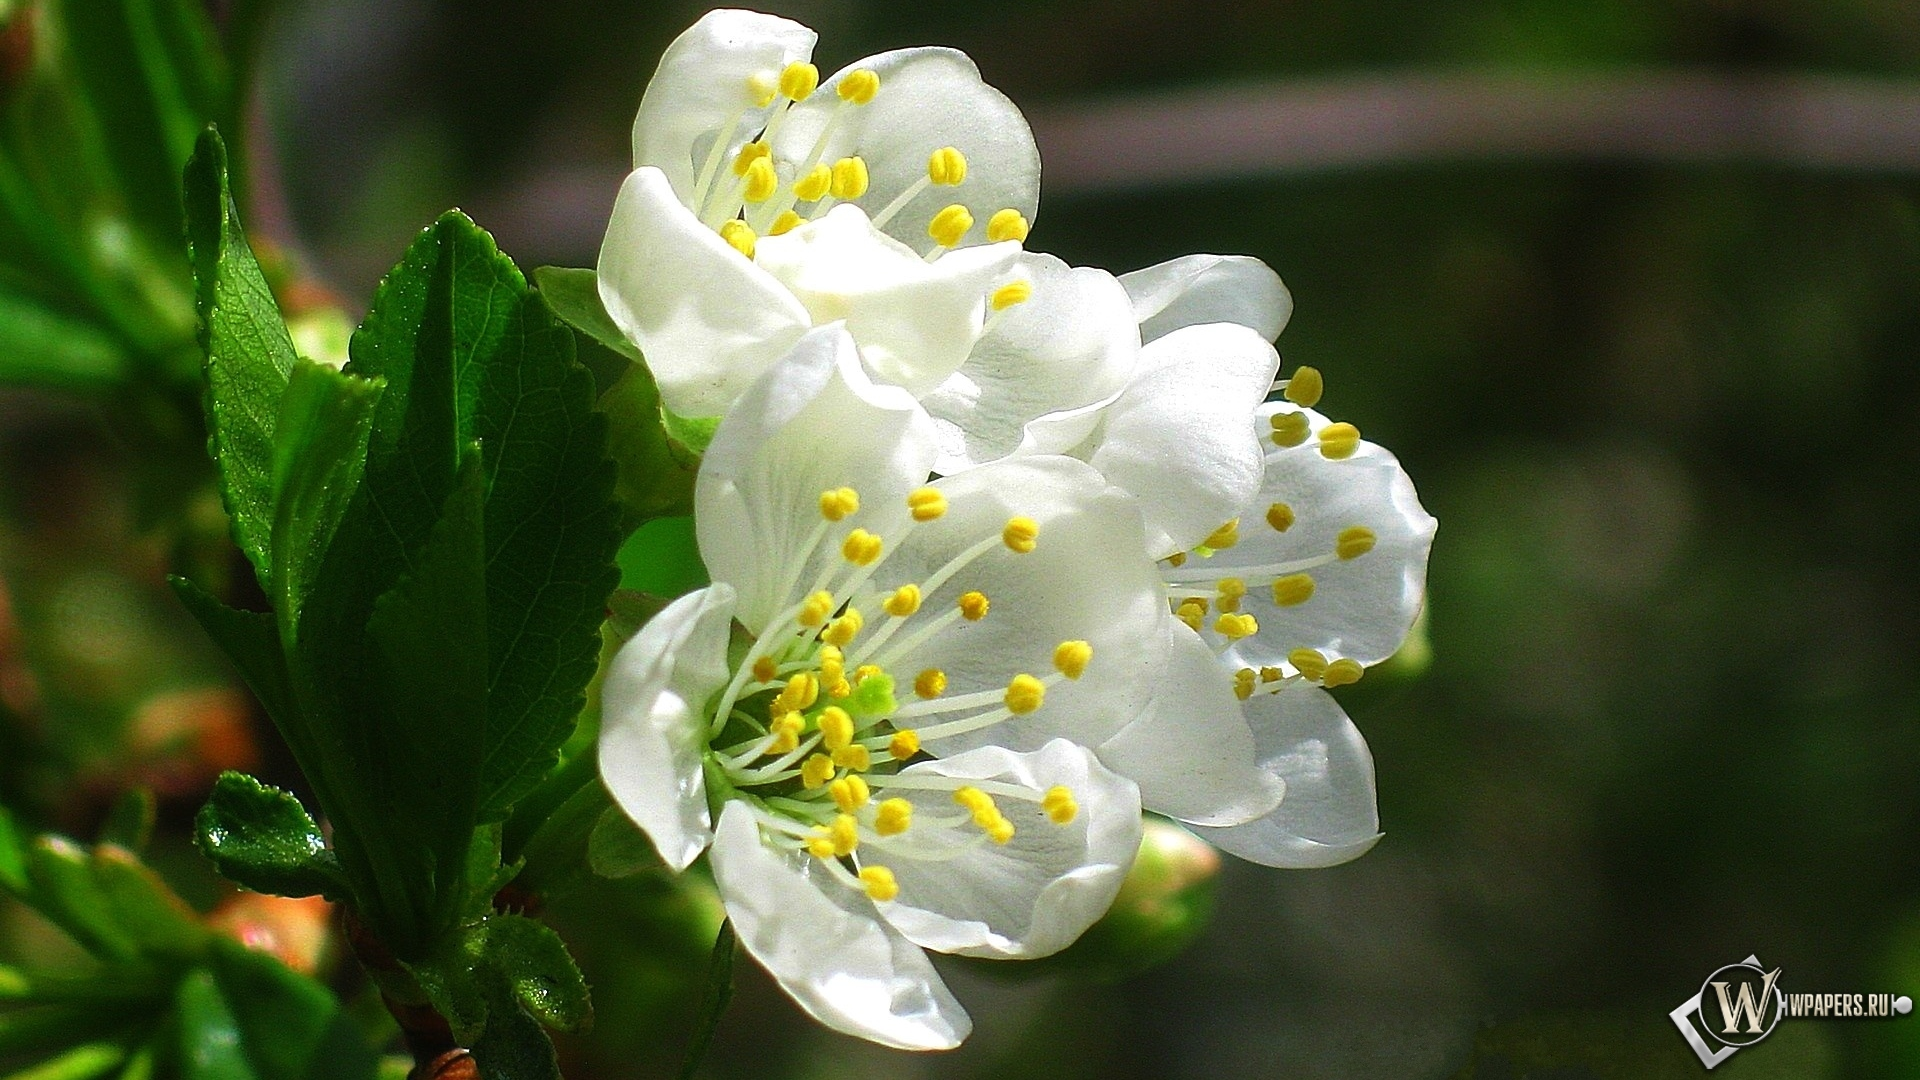 Сирень  саженцы  Питомник растений АгроСАД